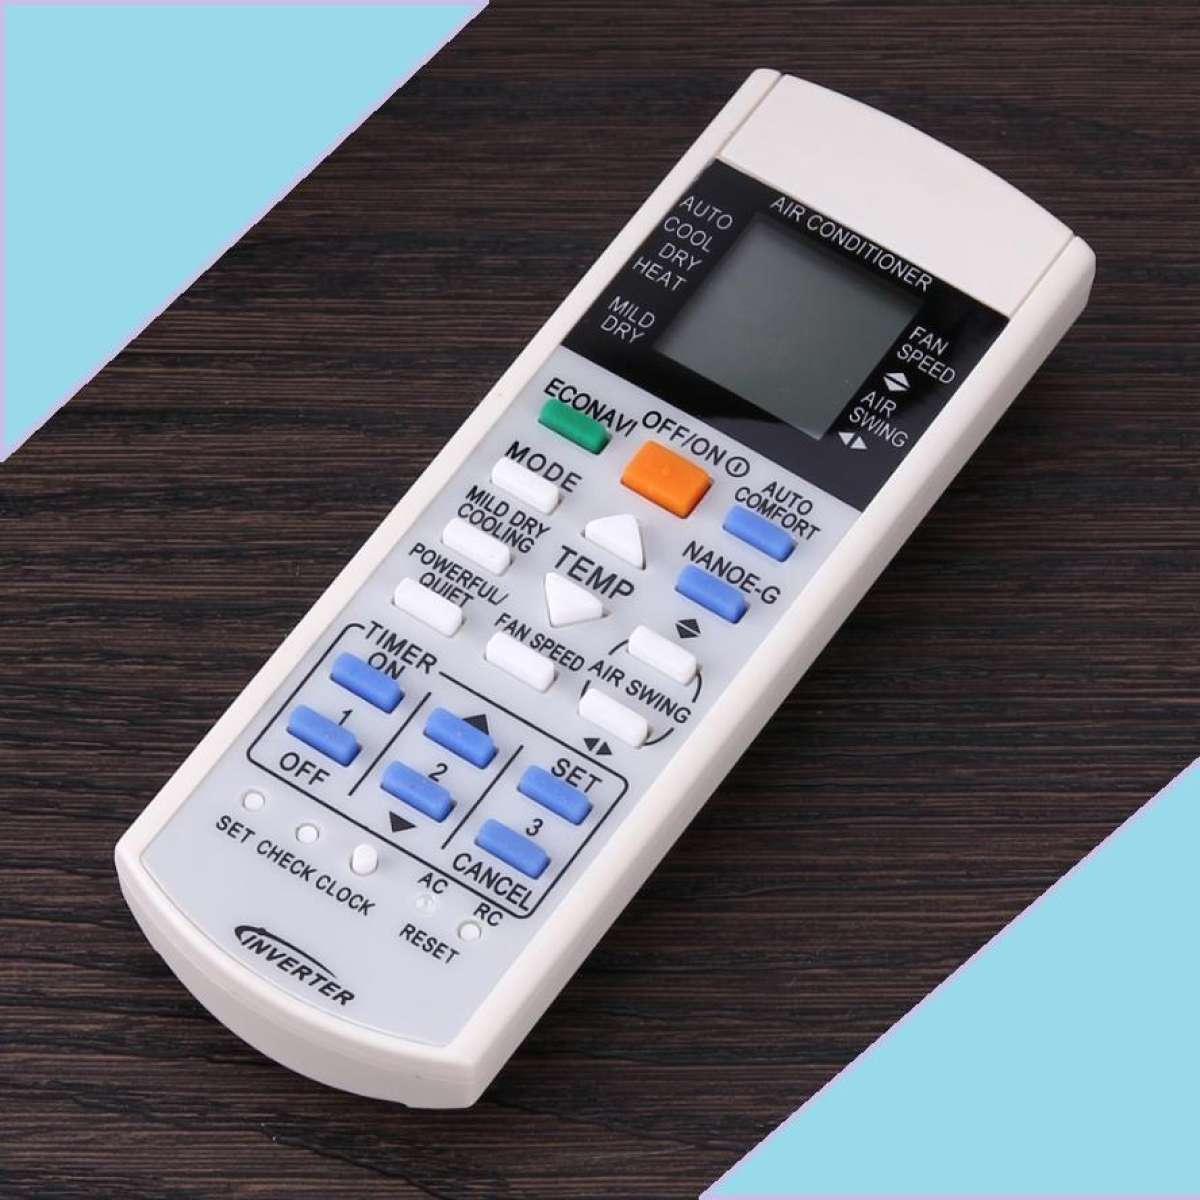 Air Conditioning Panasonic Cs Yn9skj Ac Split 1 Pk Standard R32 Jakarta Only Remote Control Remot